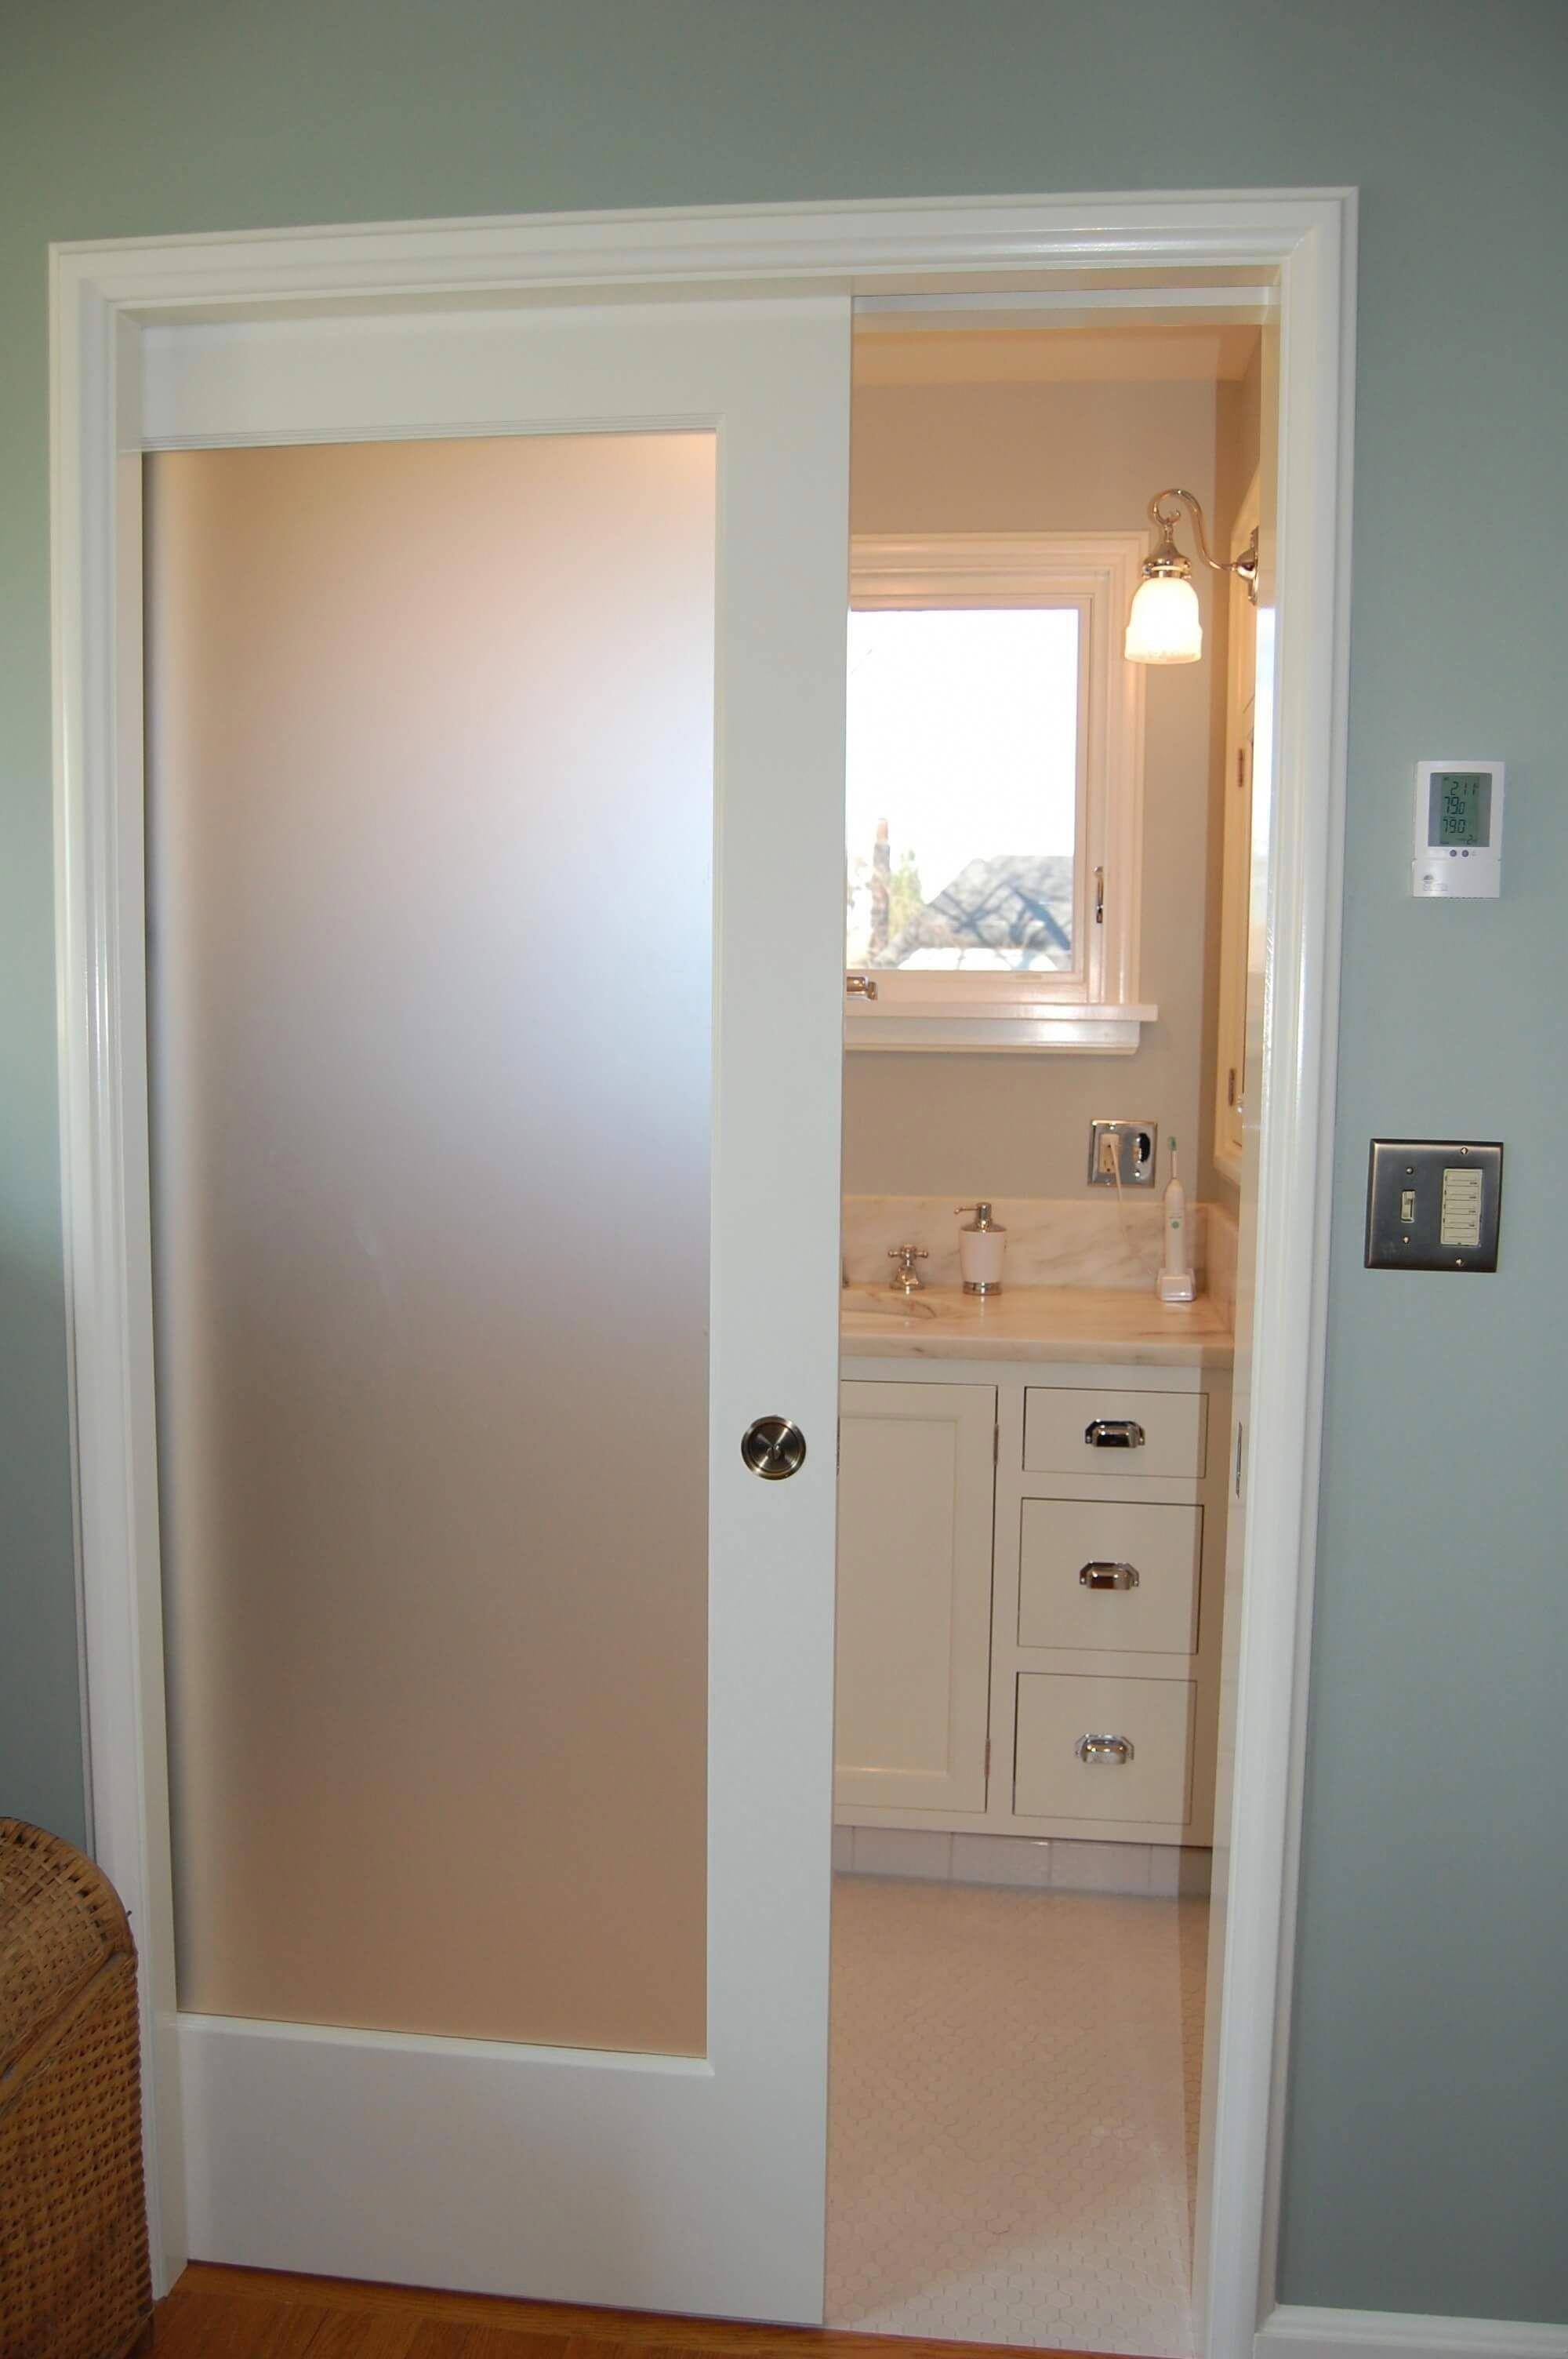 Frosted Glass Sliding Closet Doors Hardwood Front Doors 9 Foot Closet Doors Glass Pocket Doors Sliding Bathroom Doors Sliding Glass Door